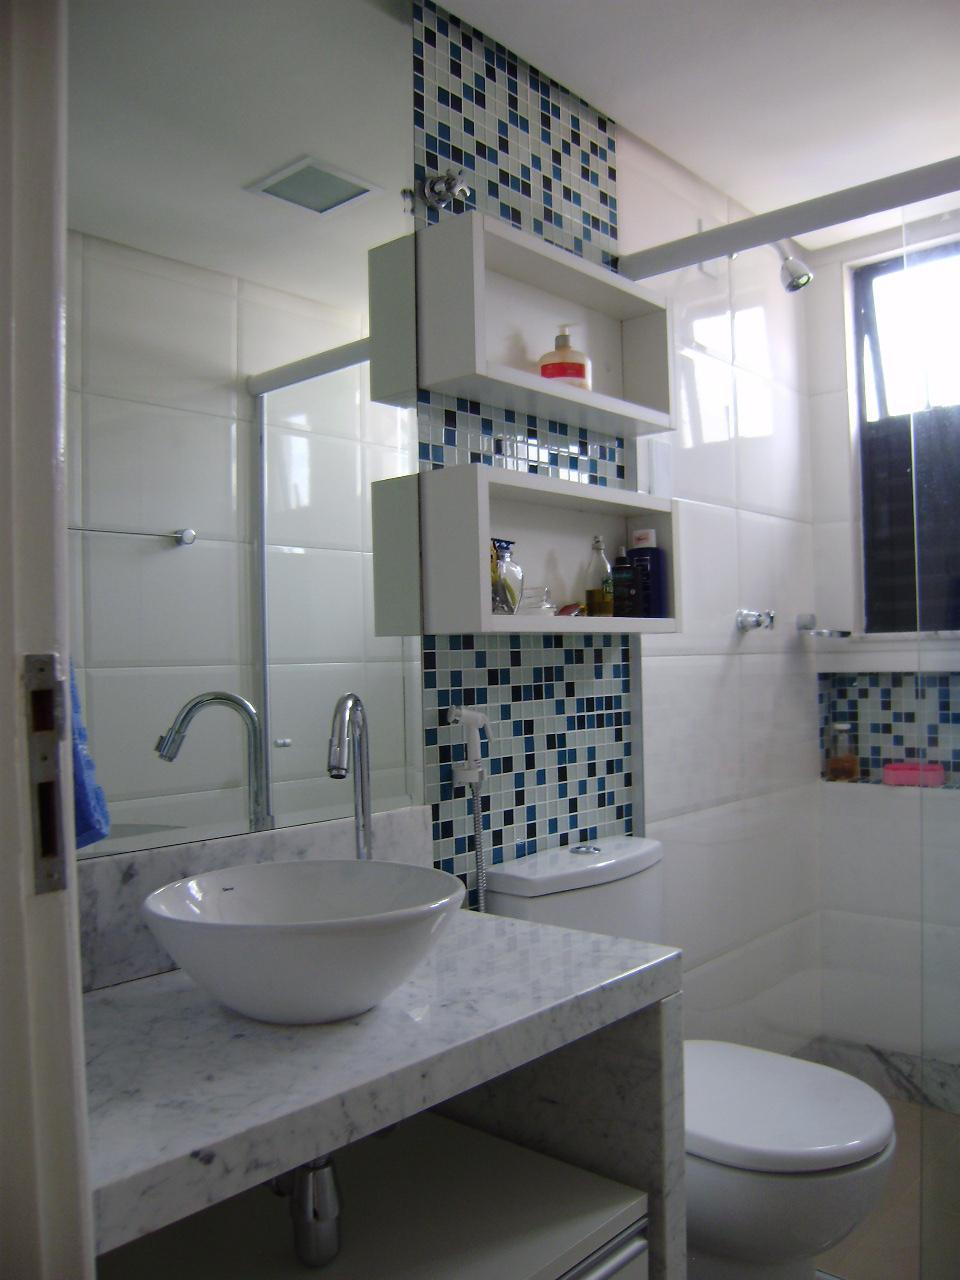 decoracao banheiro pastilhas : decoracao banheiro pastilhas:Decoracao De Banheiro Pequeno